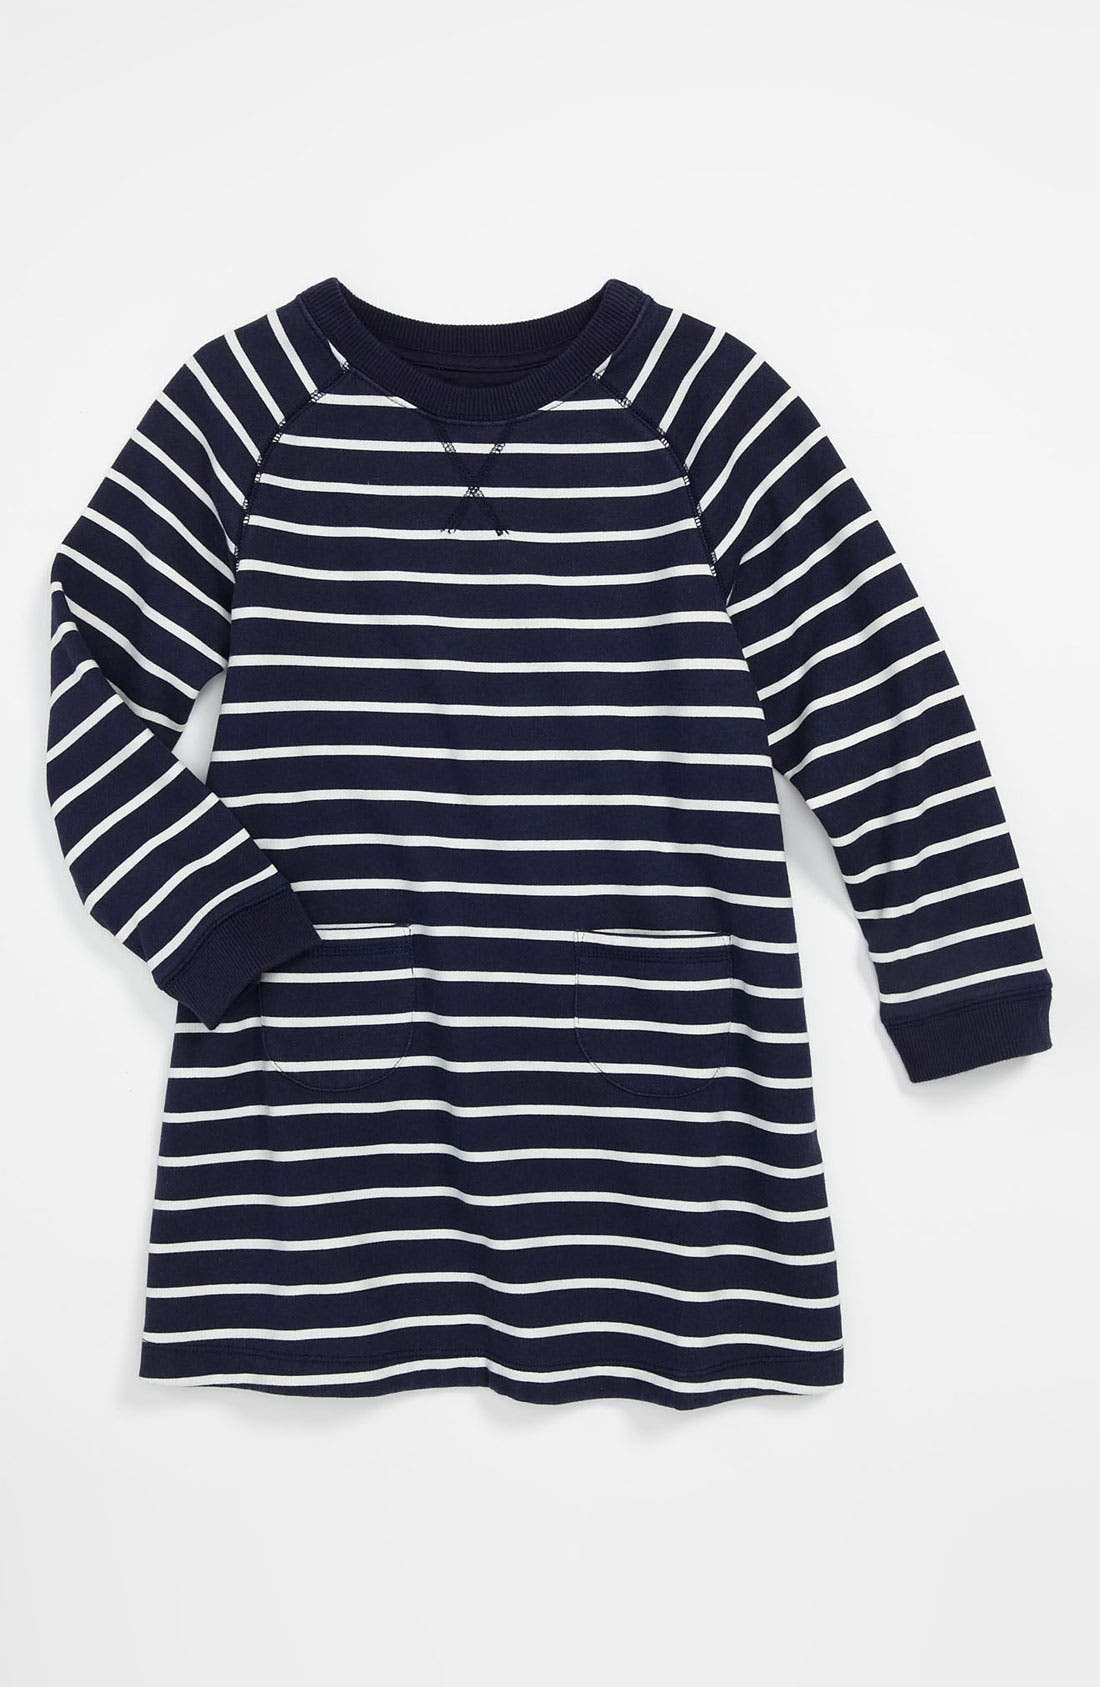 Alternate Image 1 Selected - Mini Boden 'Cozy' Sweatshirt Dress (Little Girls & Big Girls)